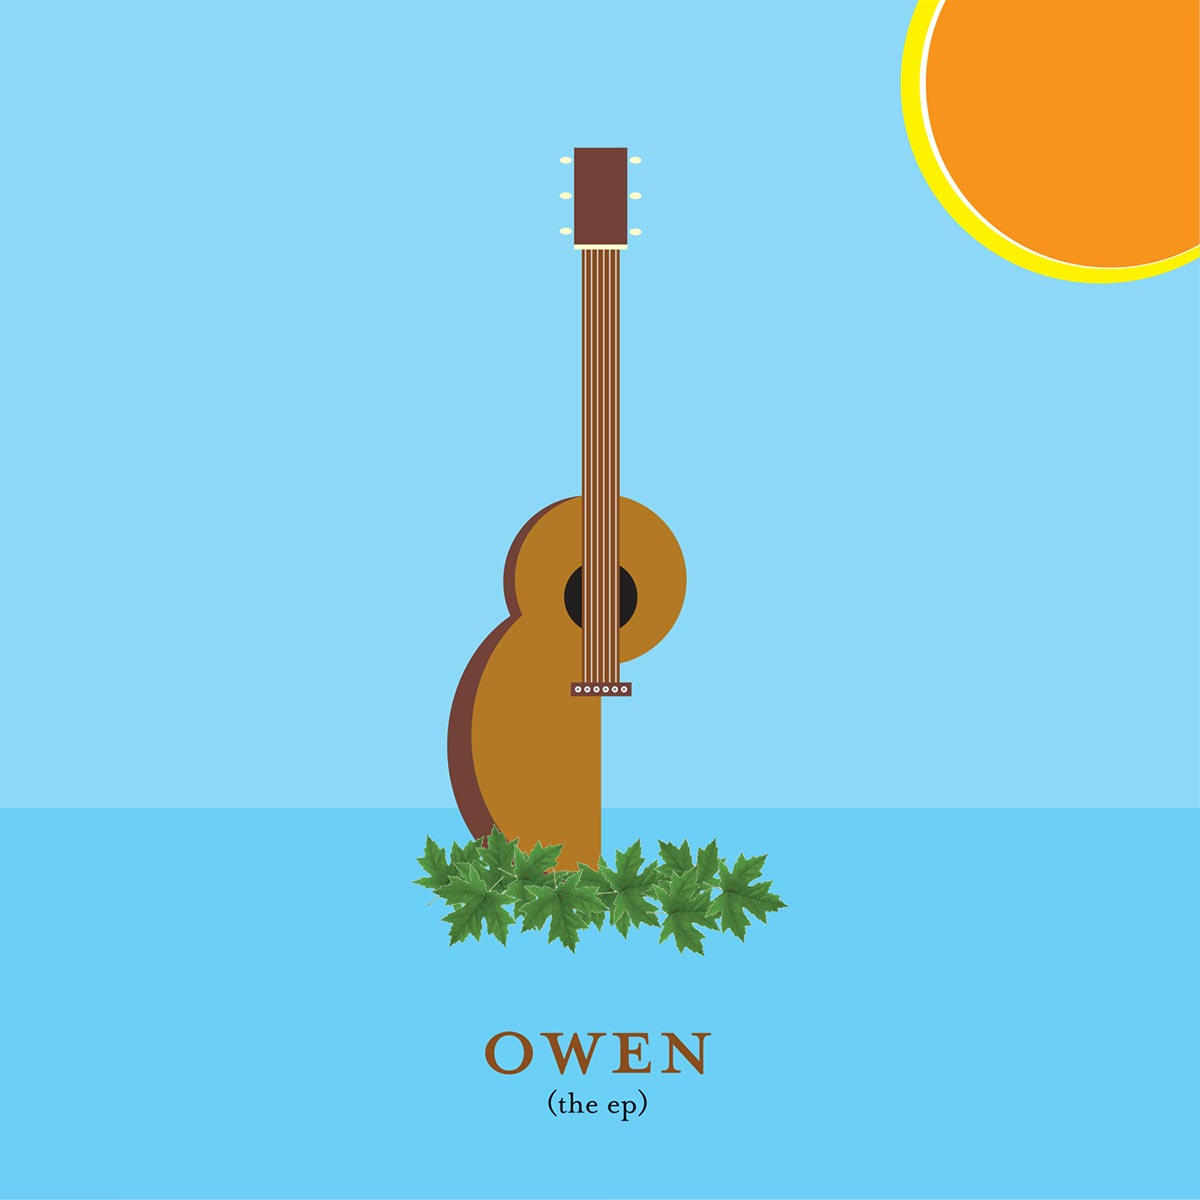 Owen_12inch_EP_cover.jpg